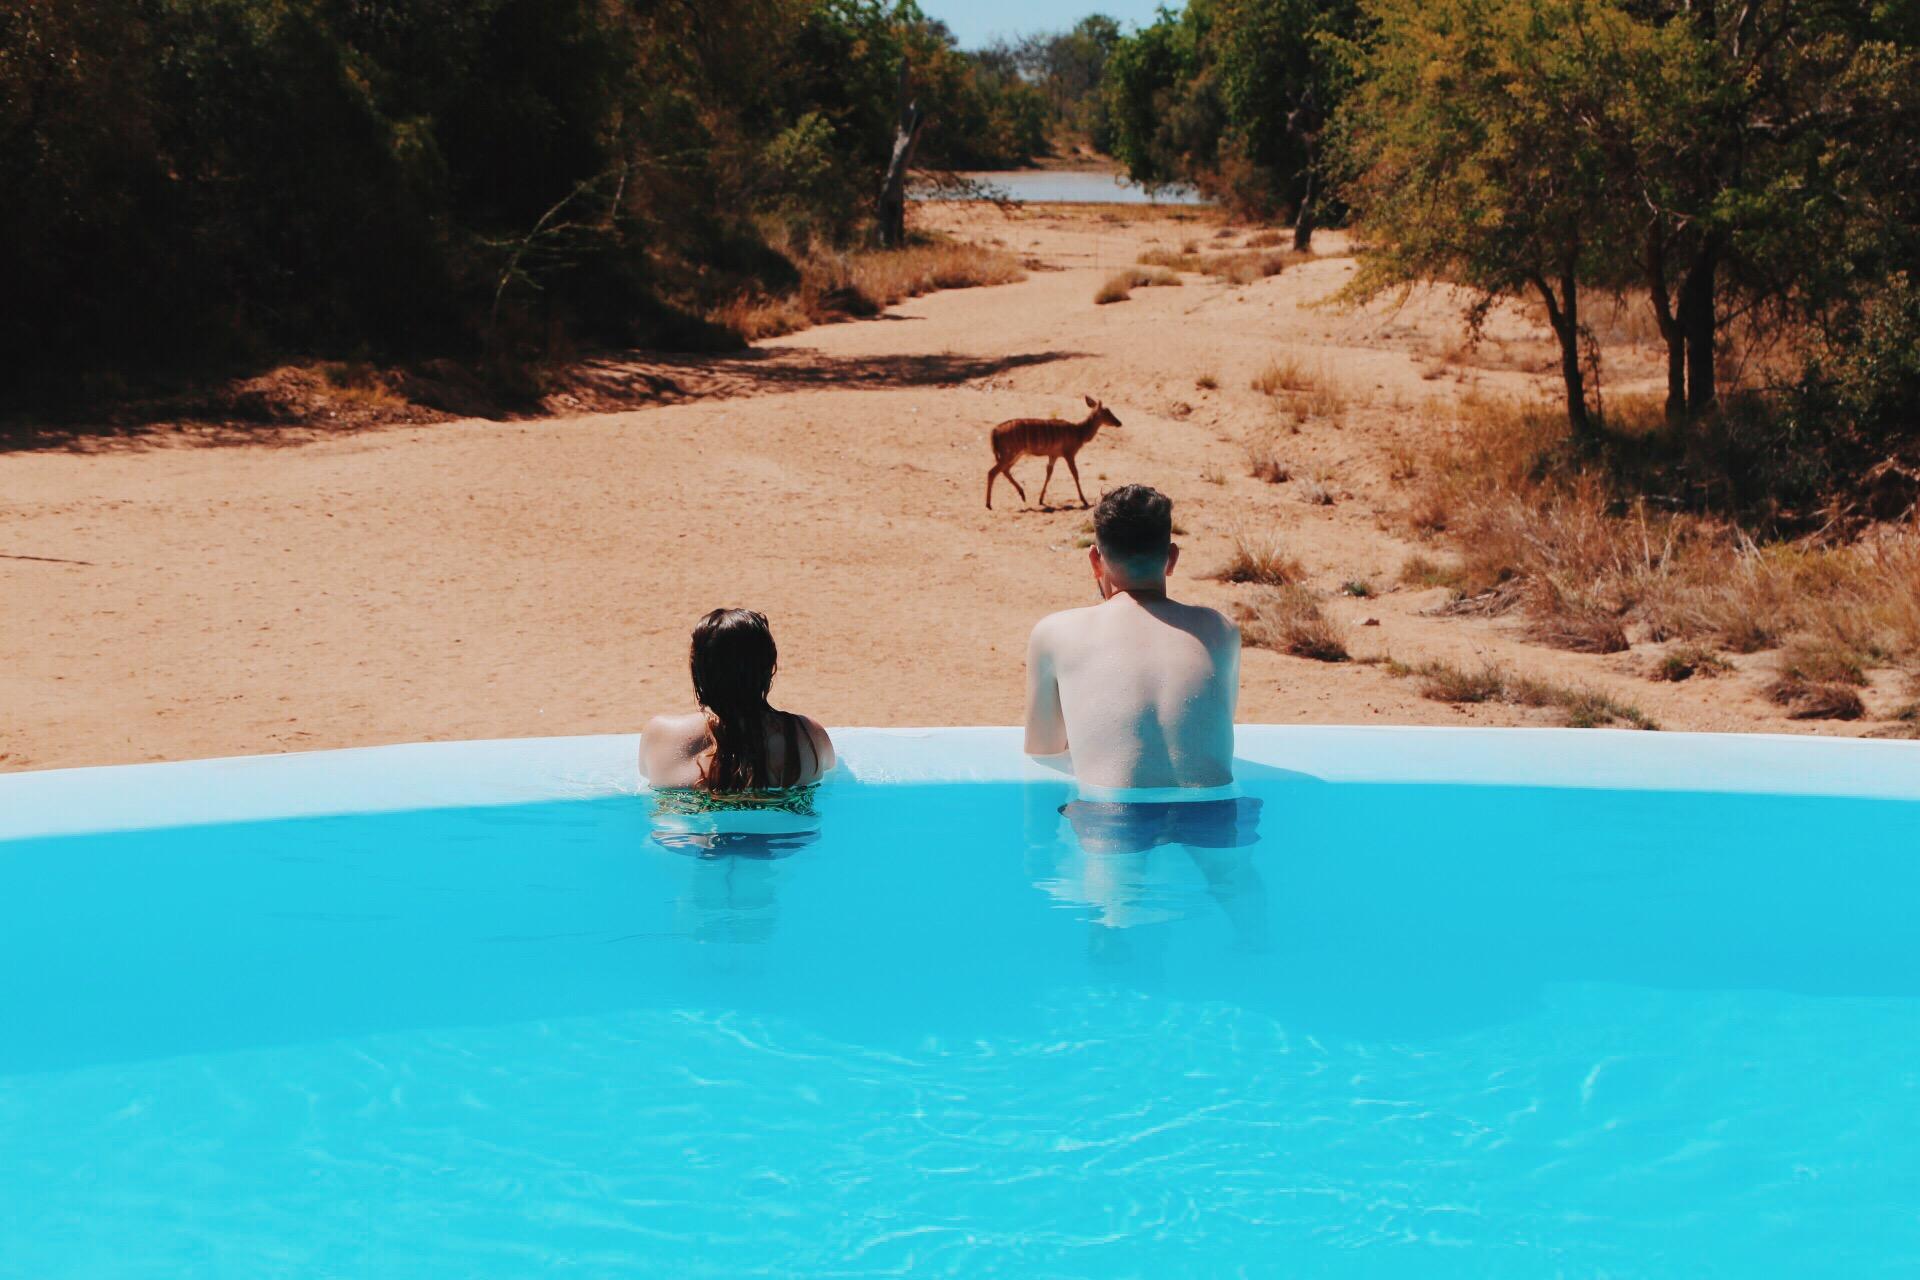 Safari In South Africa - A Photo Diary (4)